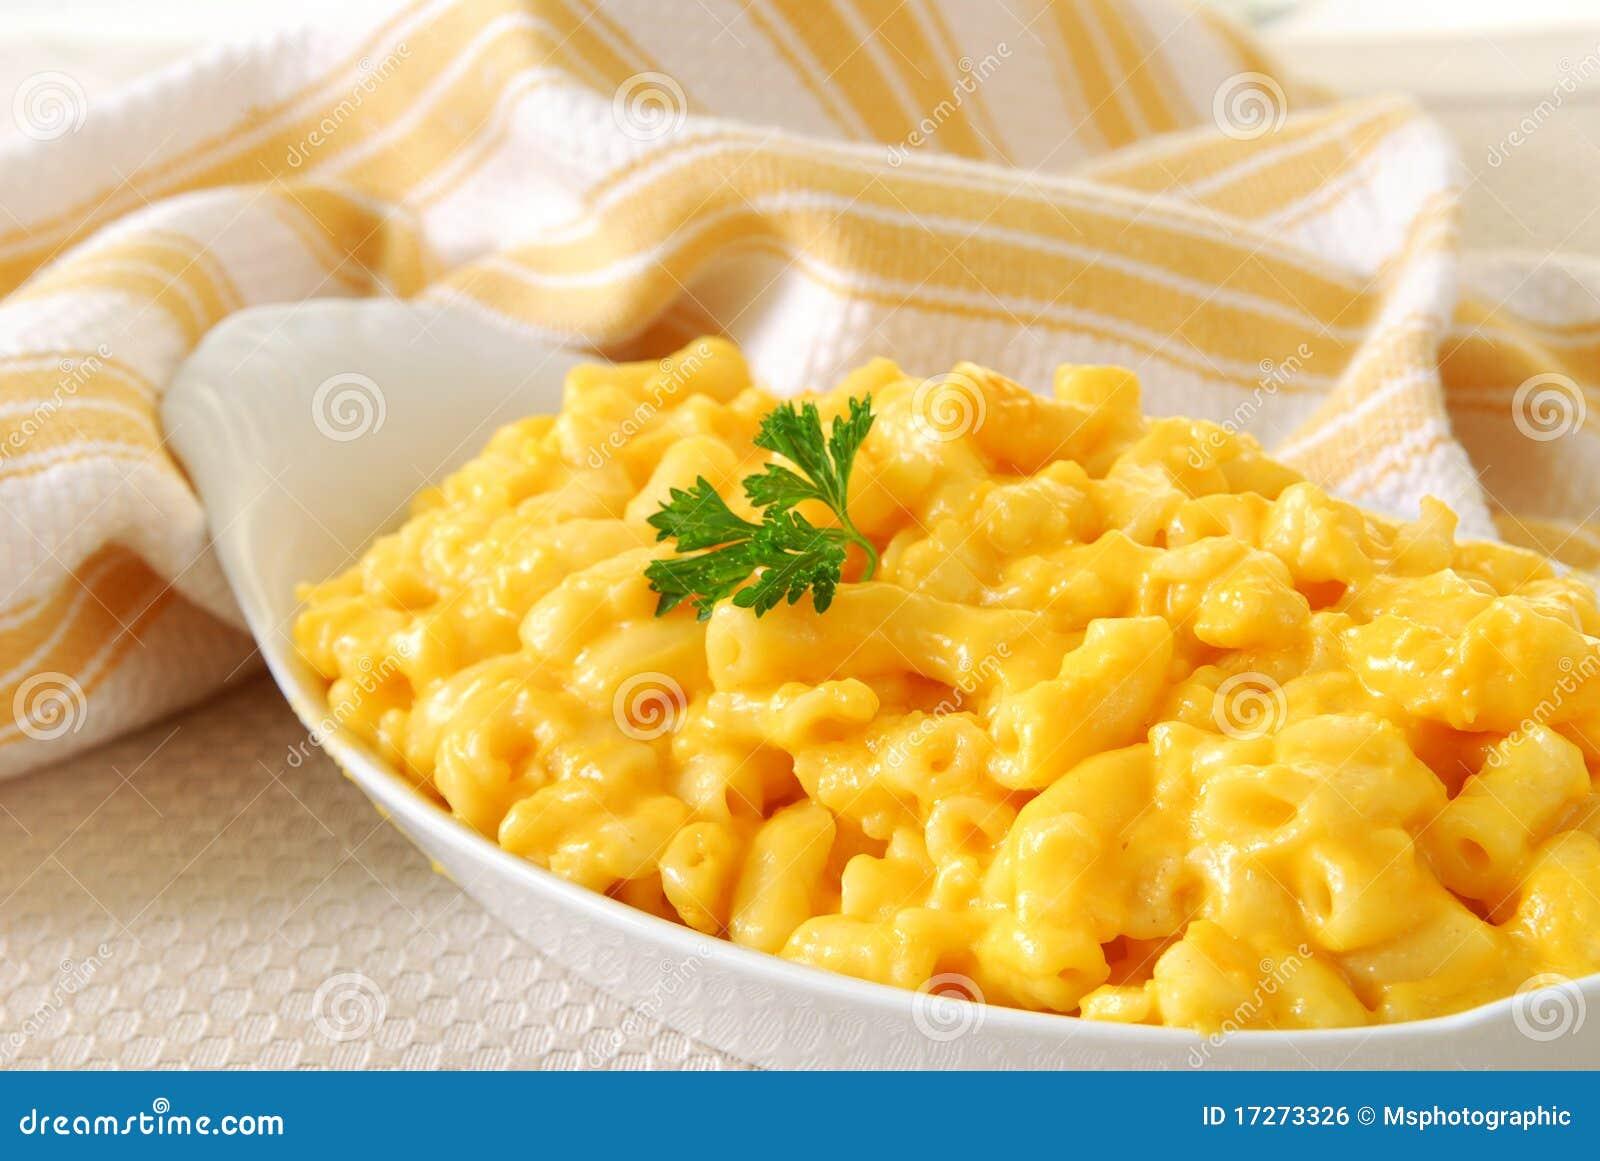 hete macaroni